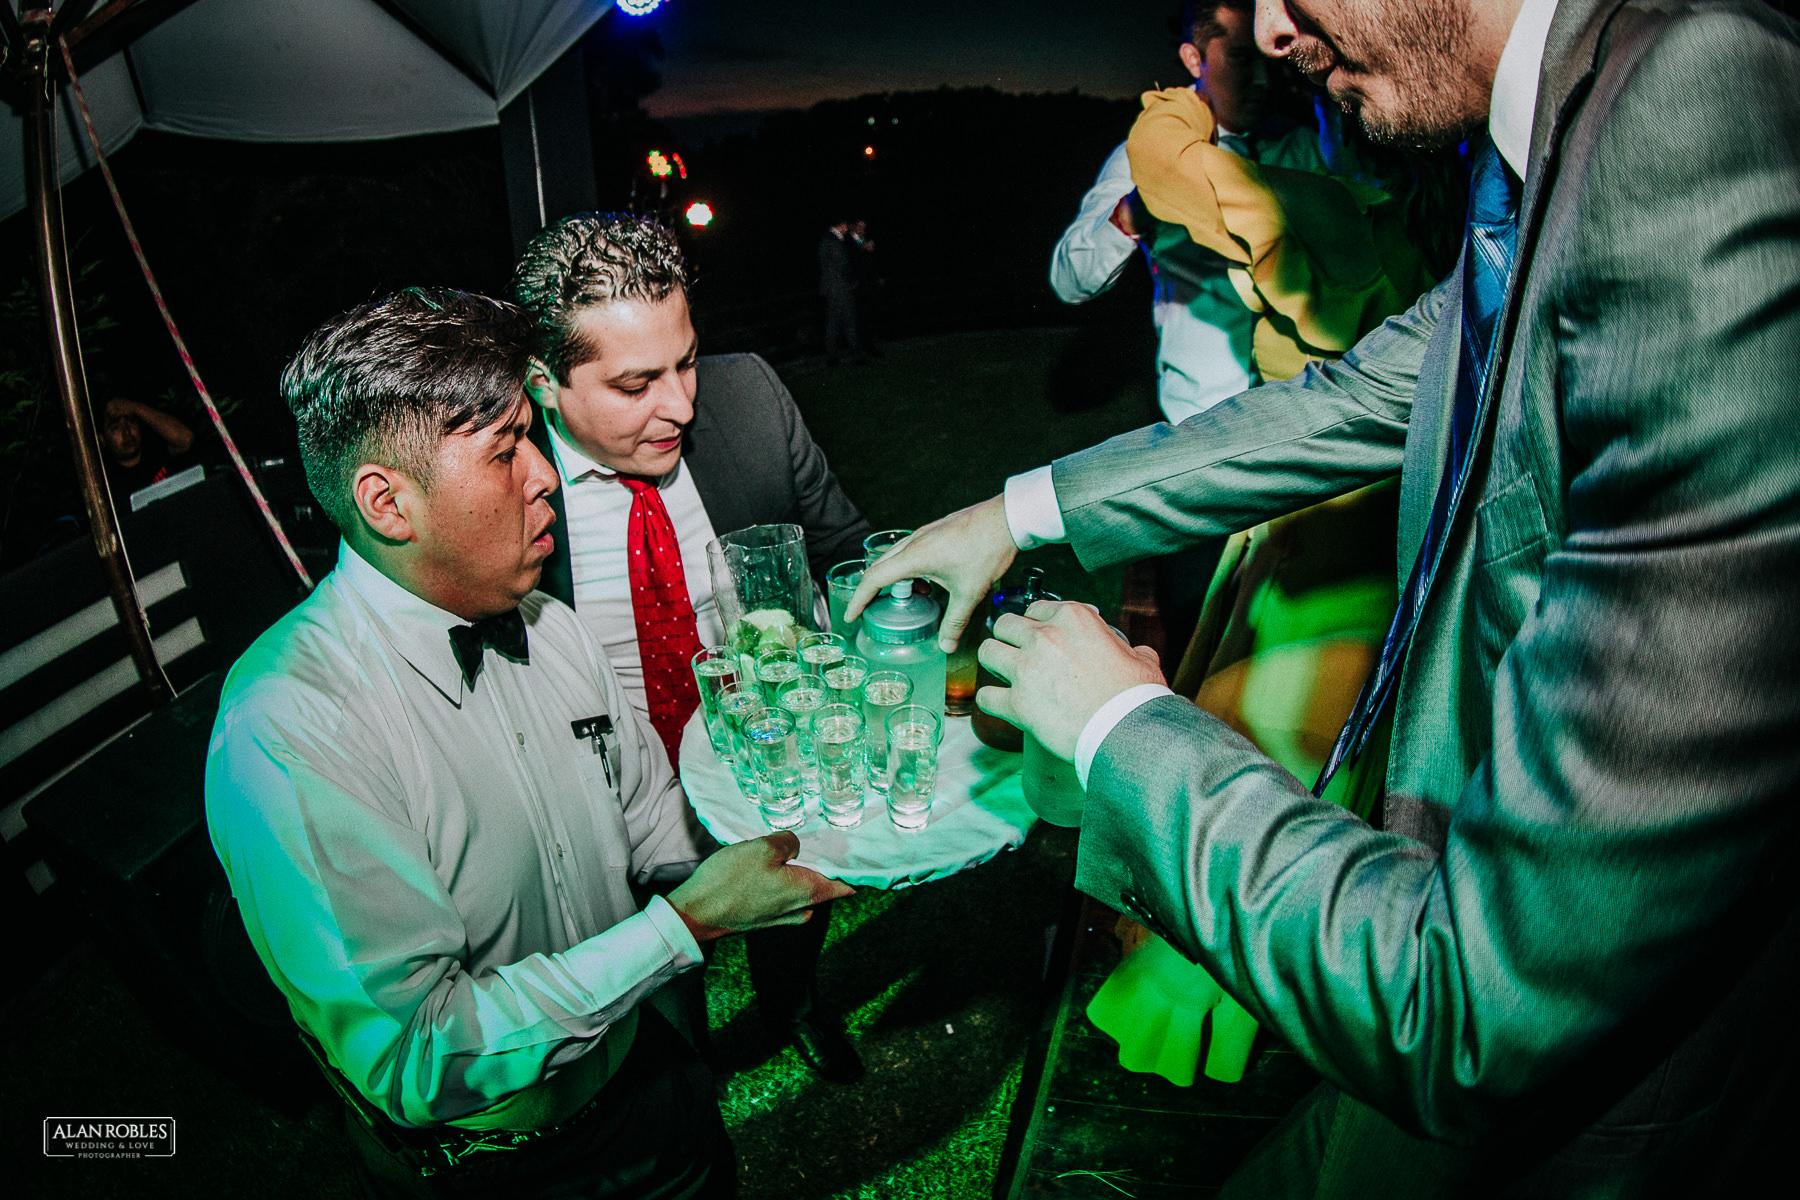 Fotografo de bodas guadalajara Alan Robles - Pinare terraza bistro 63